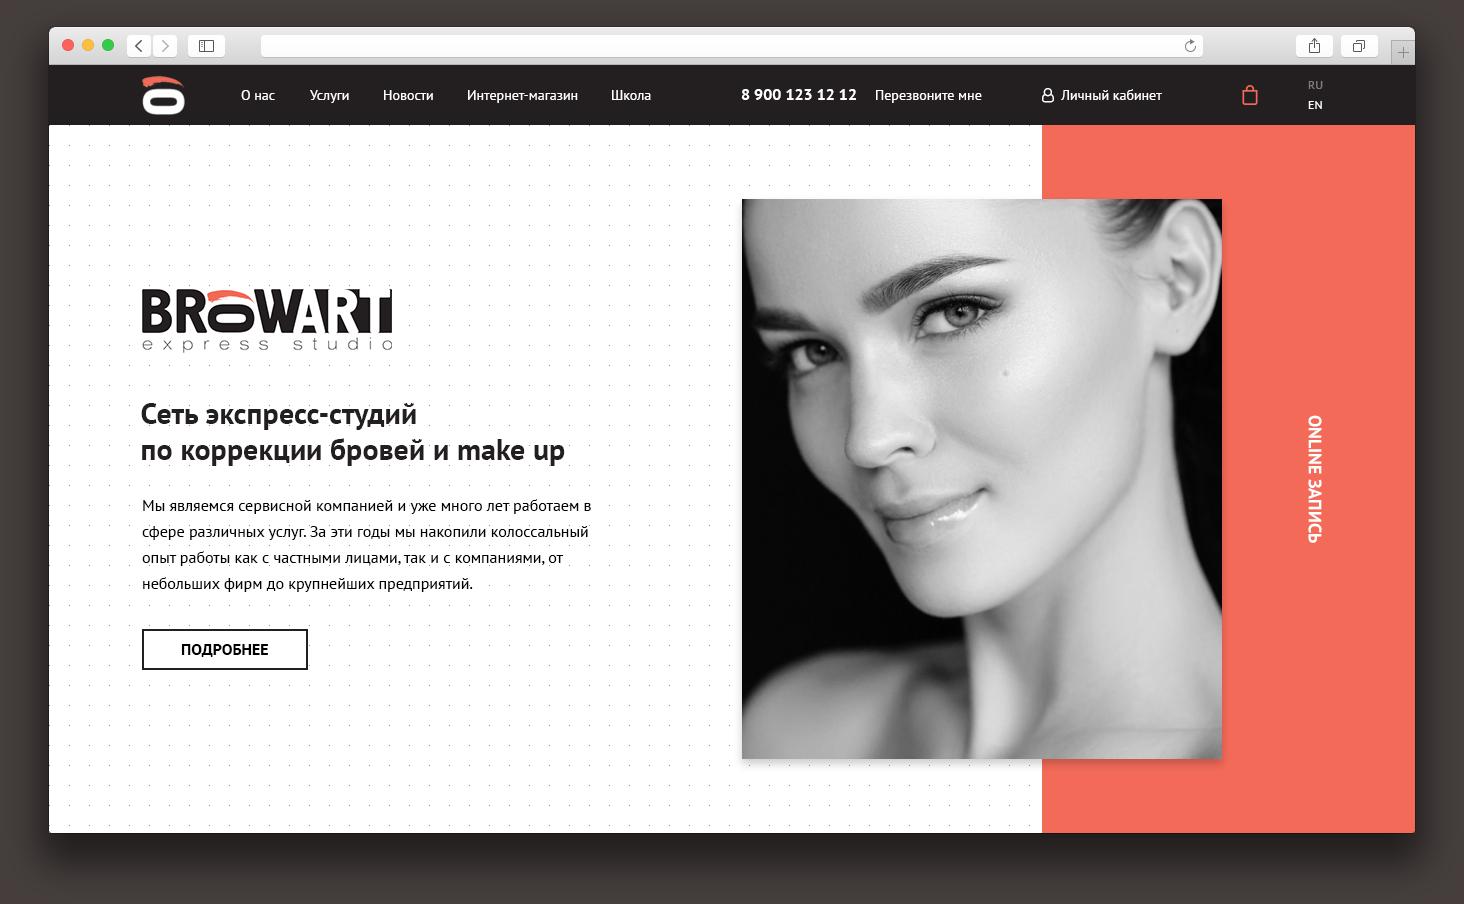 Дизайн сайта на основе готового прототипа-схемы и концепции фото f_5495a268d23d8009.png